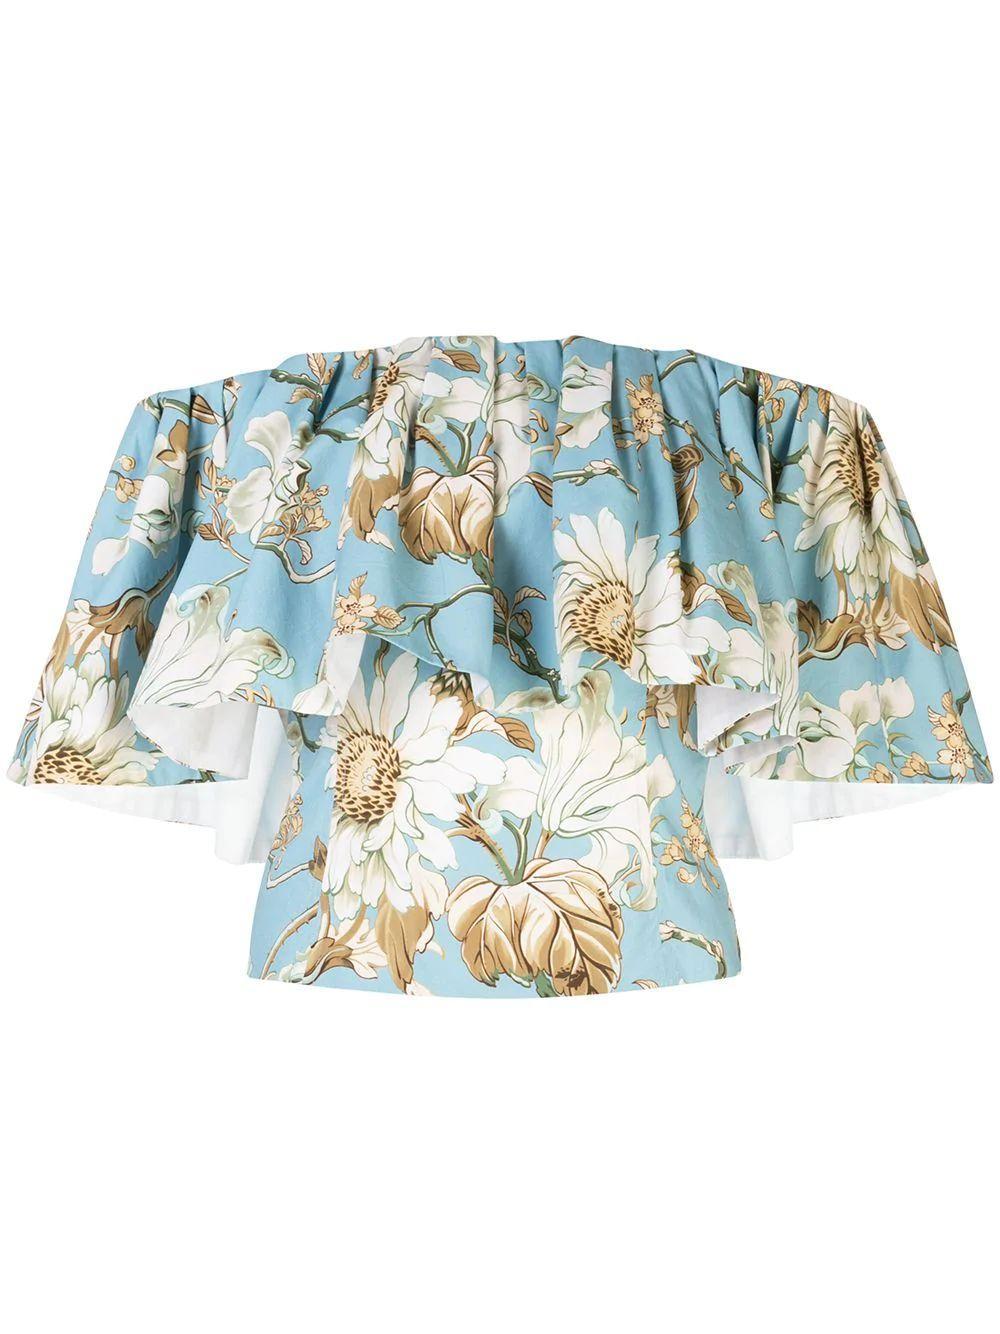 Off The Shoulder Floral Motif Blouse Item # 20PN734IDP